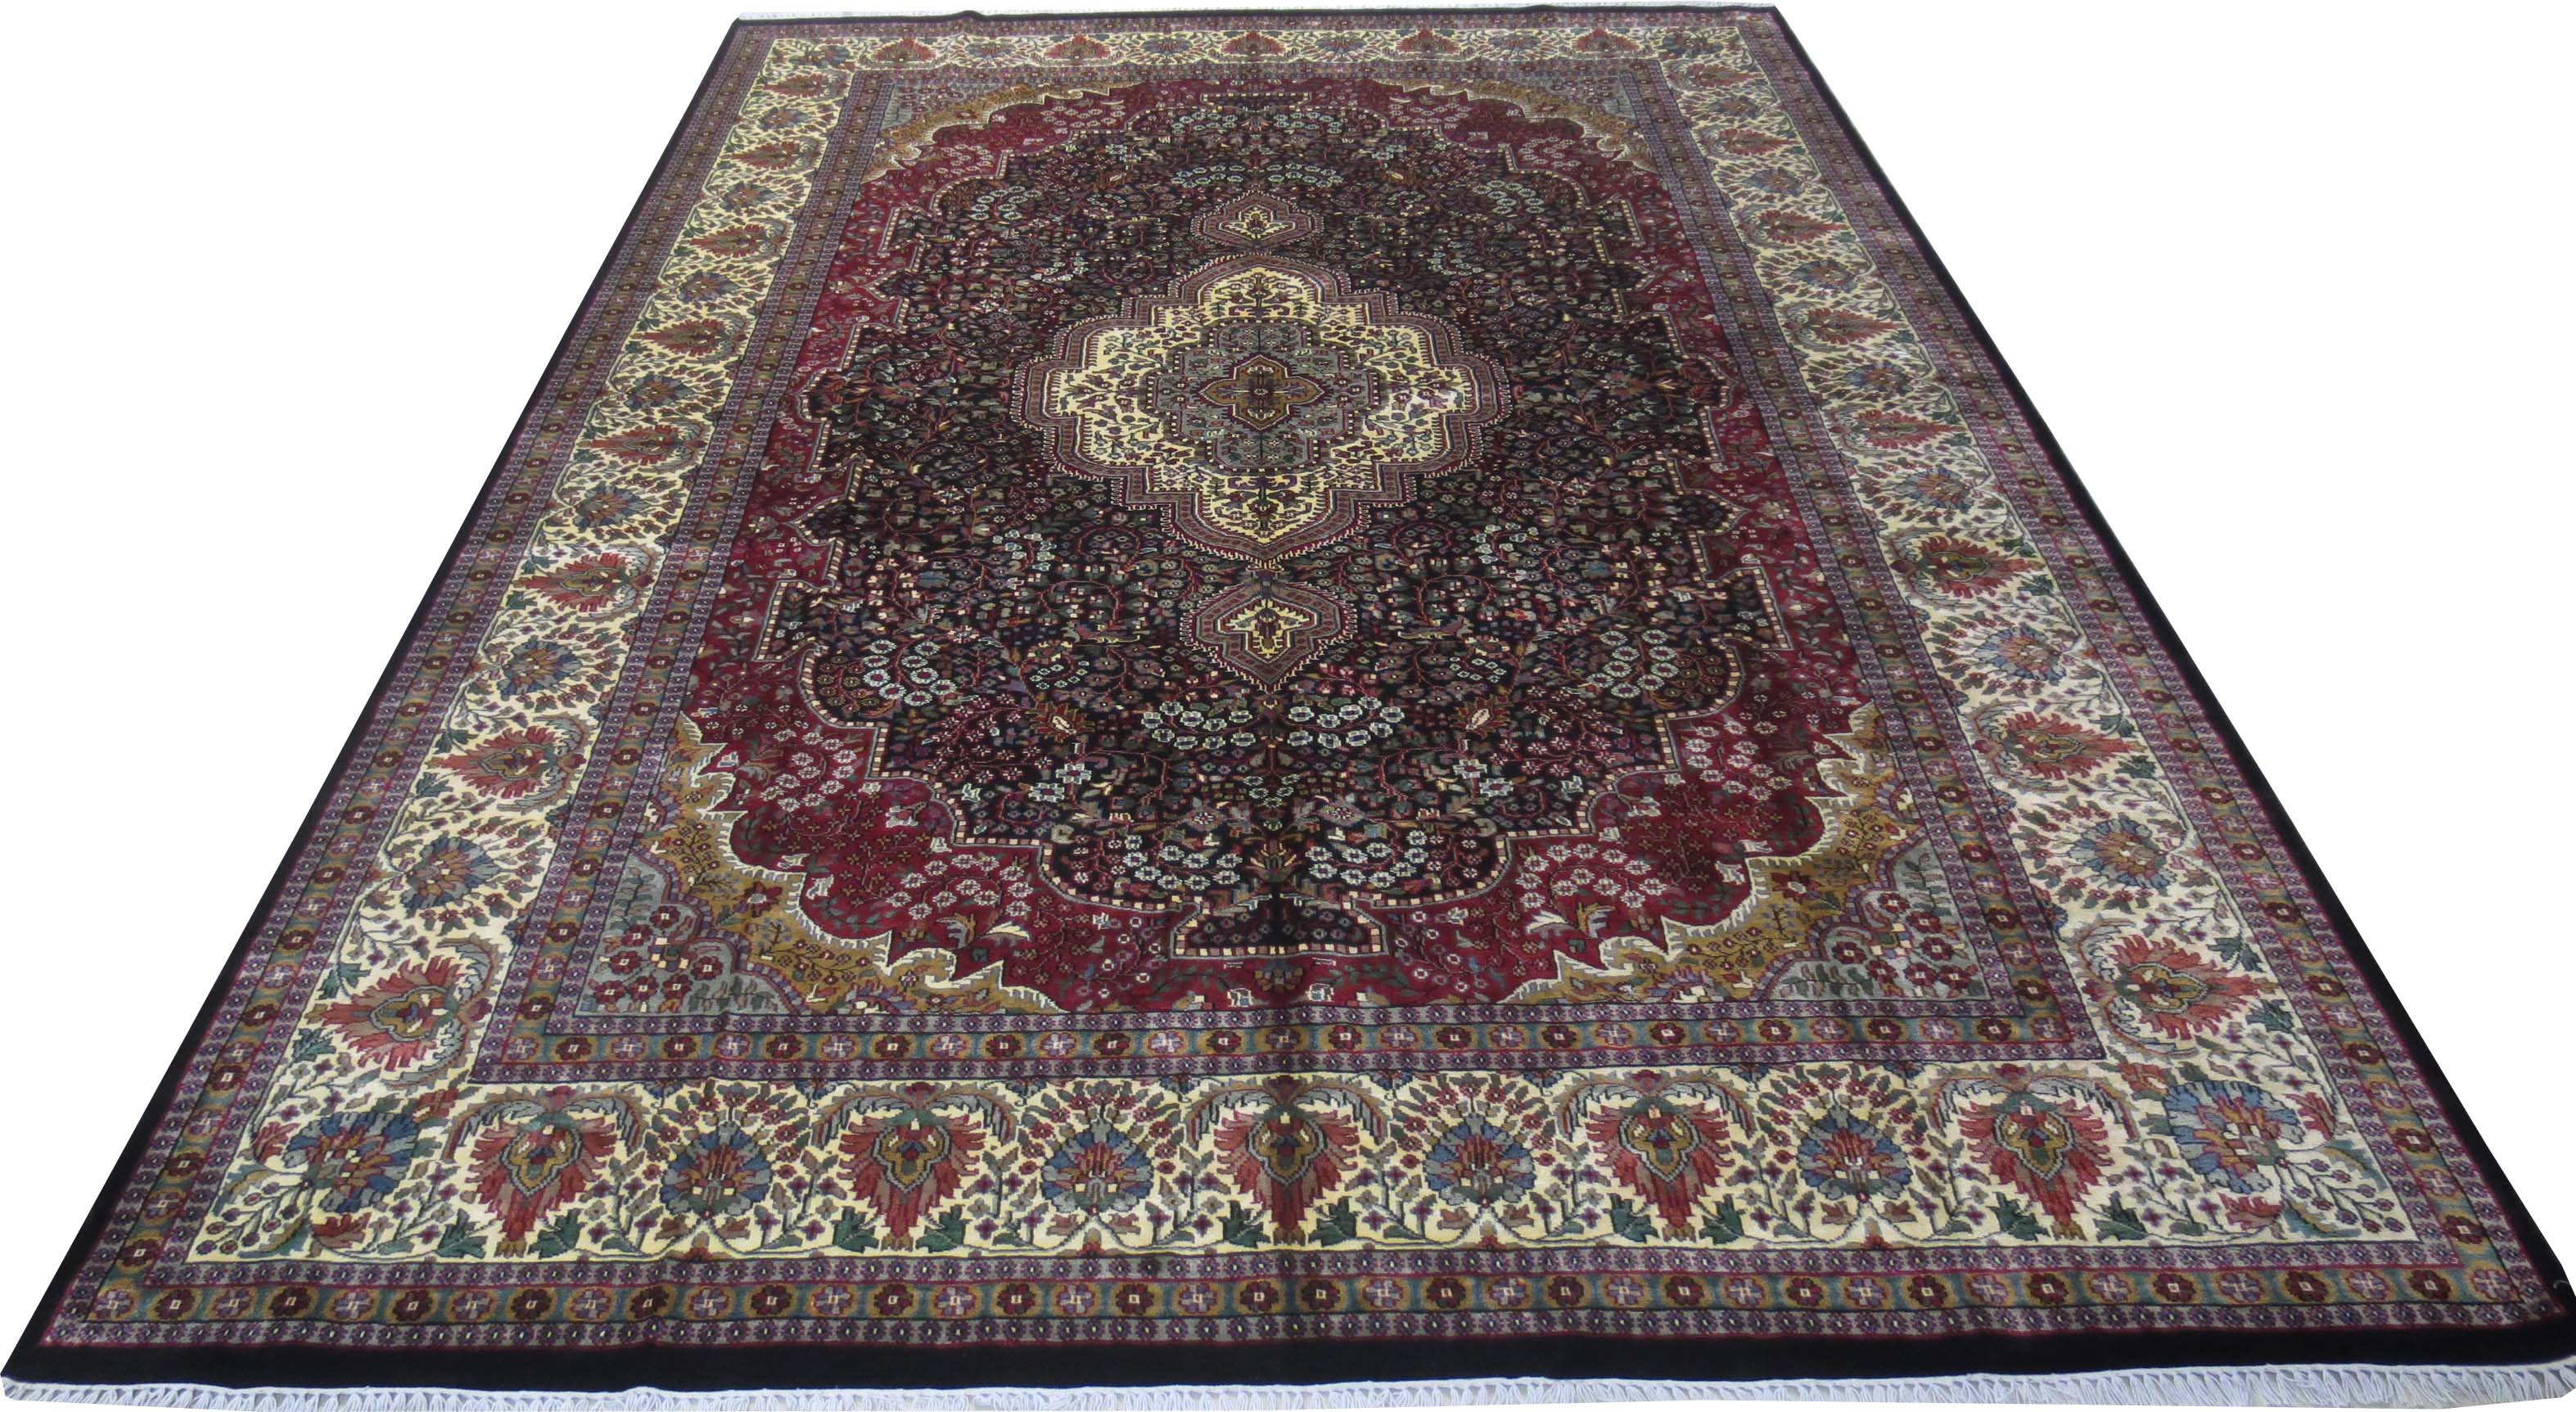 Rugs On Hardwood Floors Handmade 9 X 12 Silk Blend Kashmir